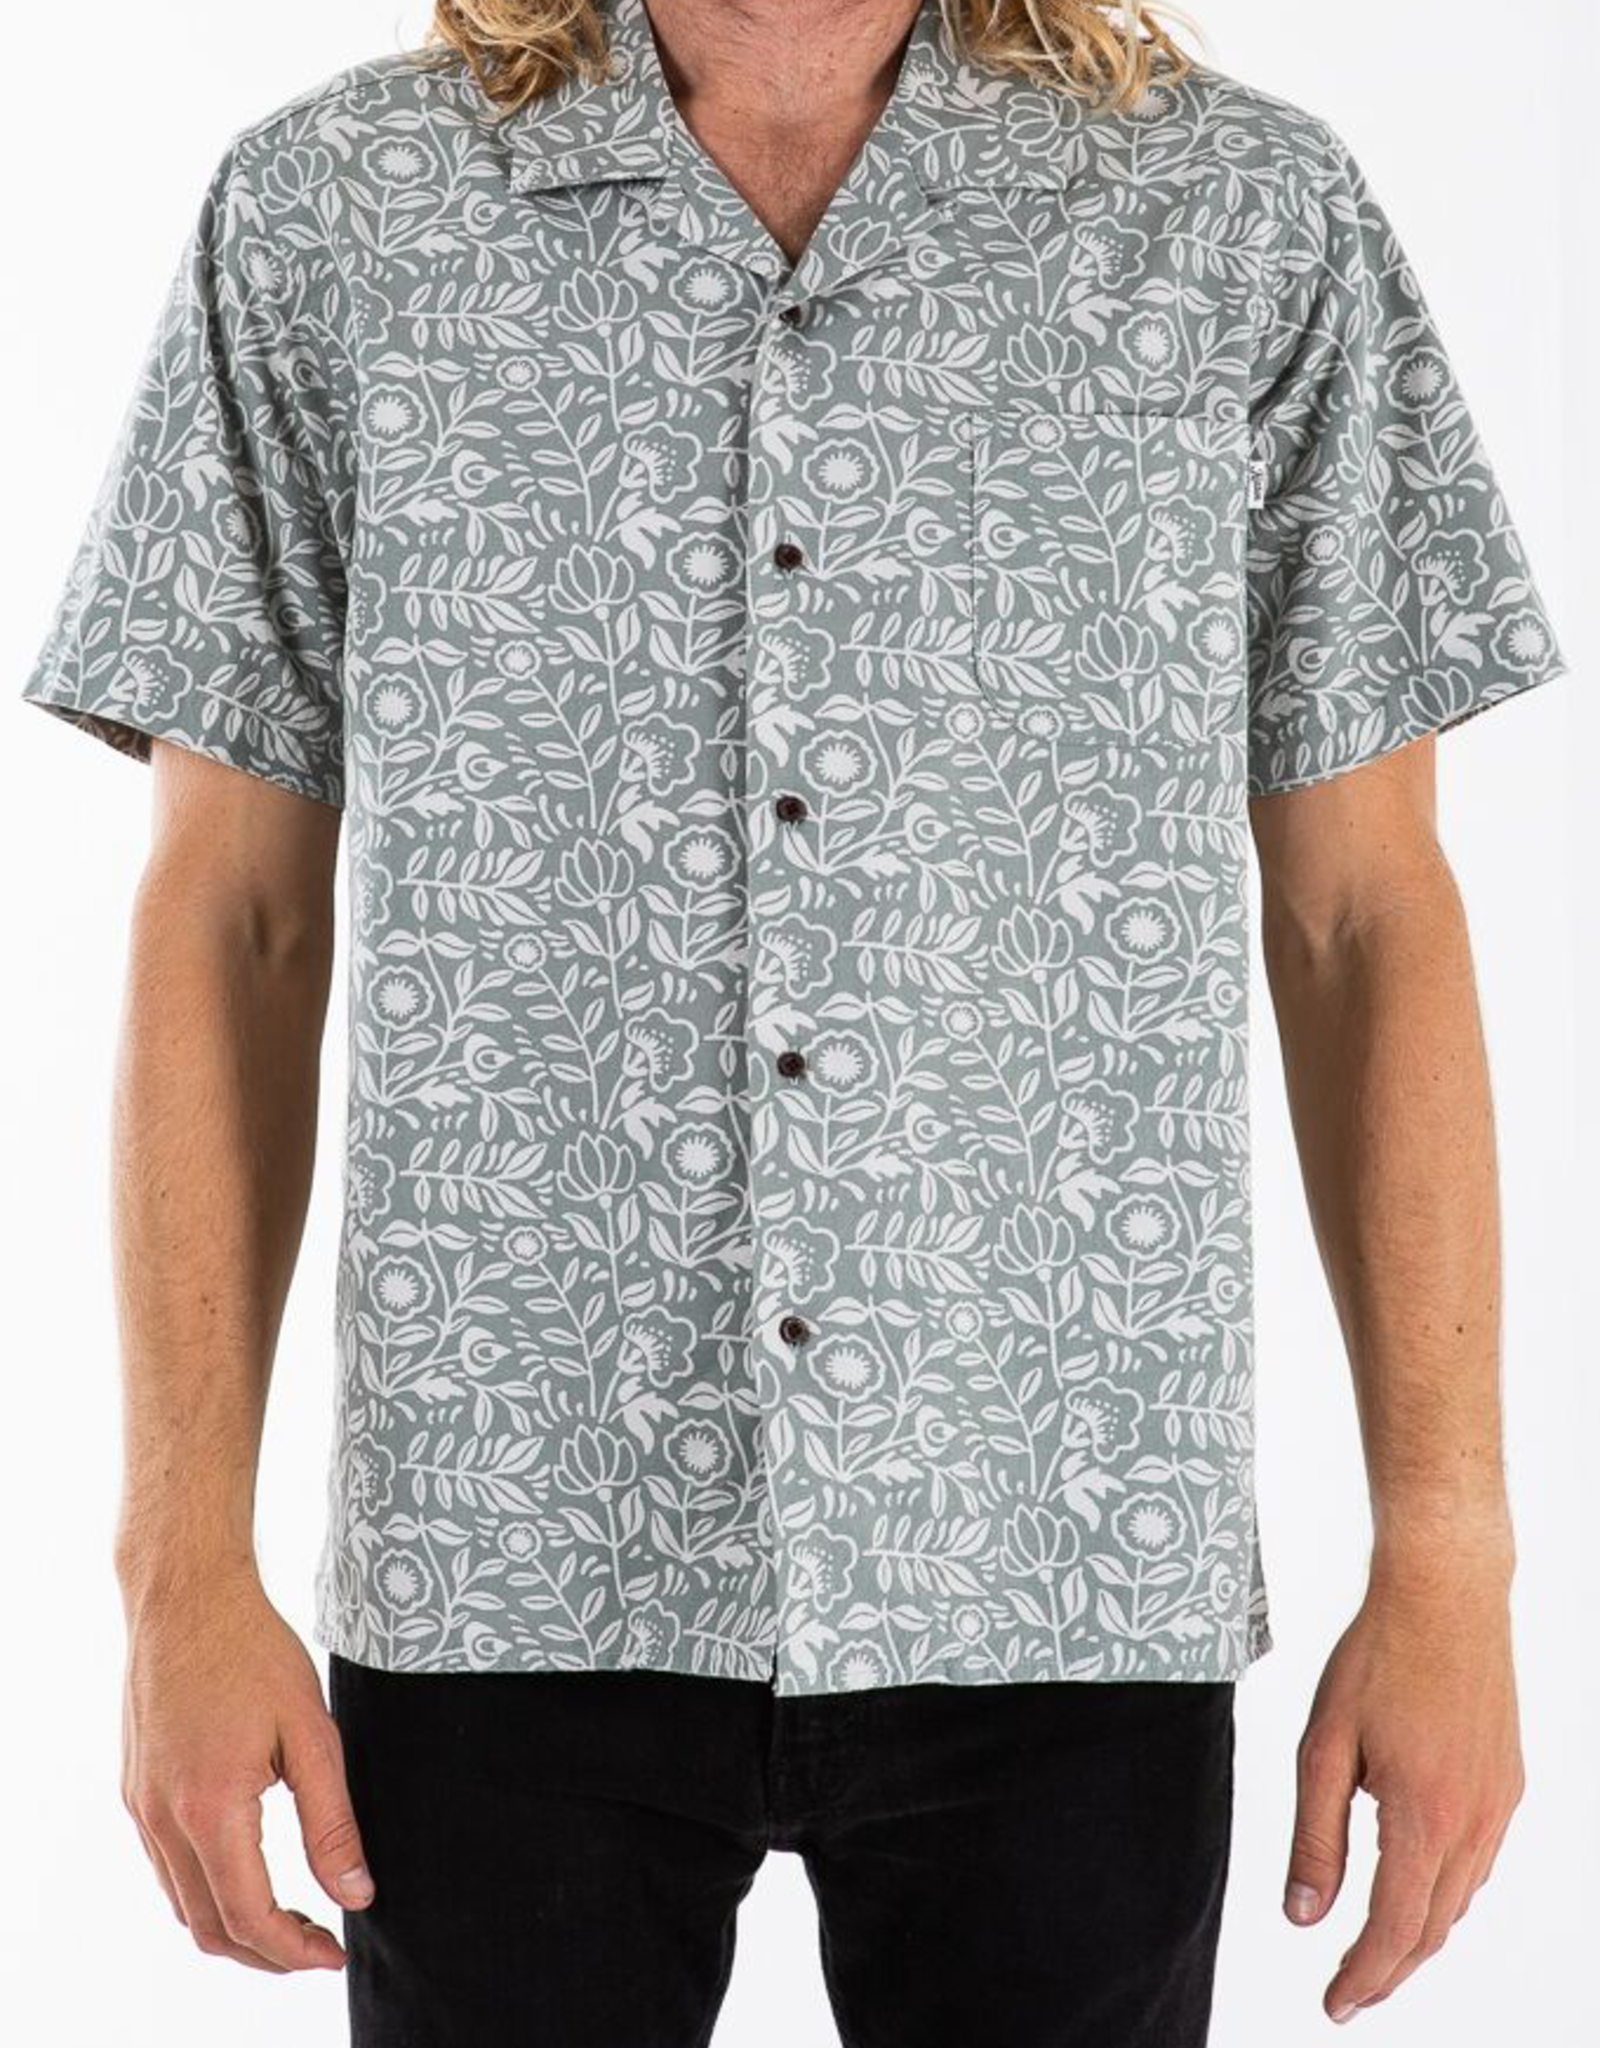 Katin USA Leary Aloha Shirt-Grey Green